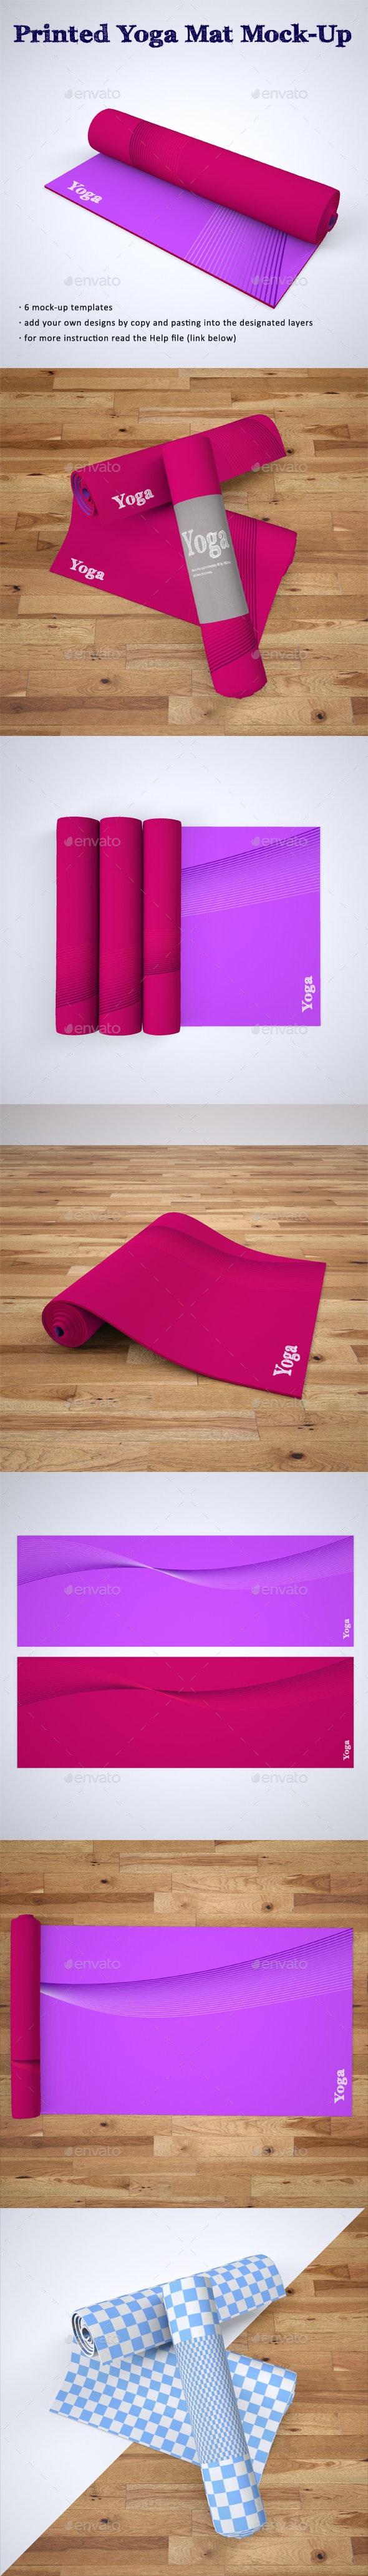 Printed Yoga Mat Exercise Rug Mock-Up - Miscellaneous Print